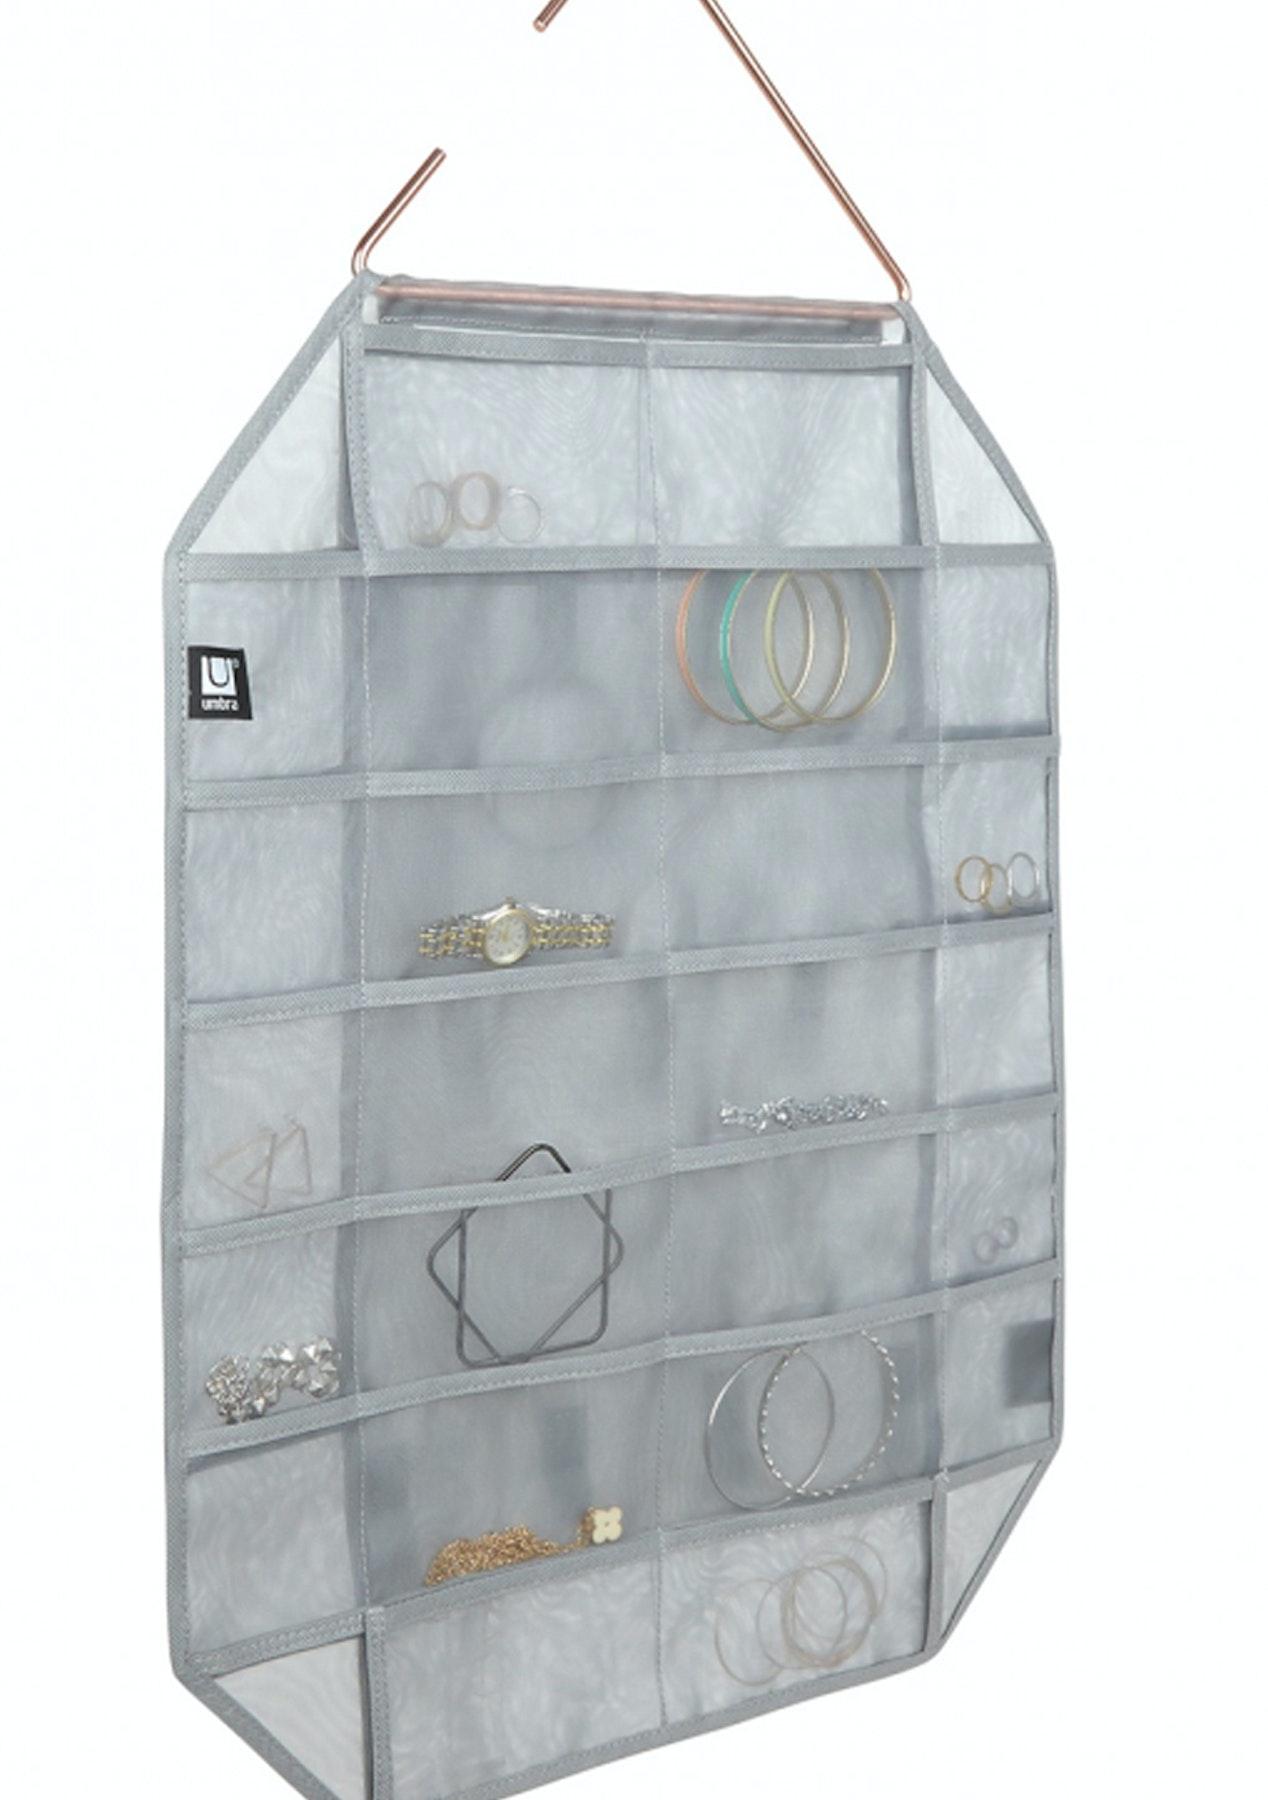 Facetta jewelry organizer grey umbra homewares onceit for Terrace jewelry organizer by umbra